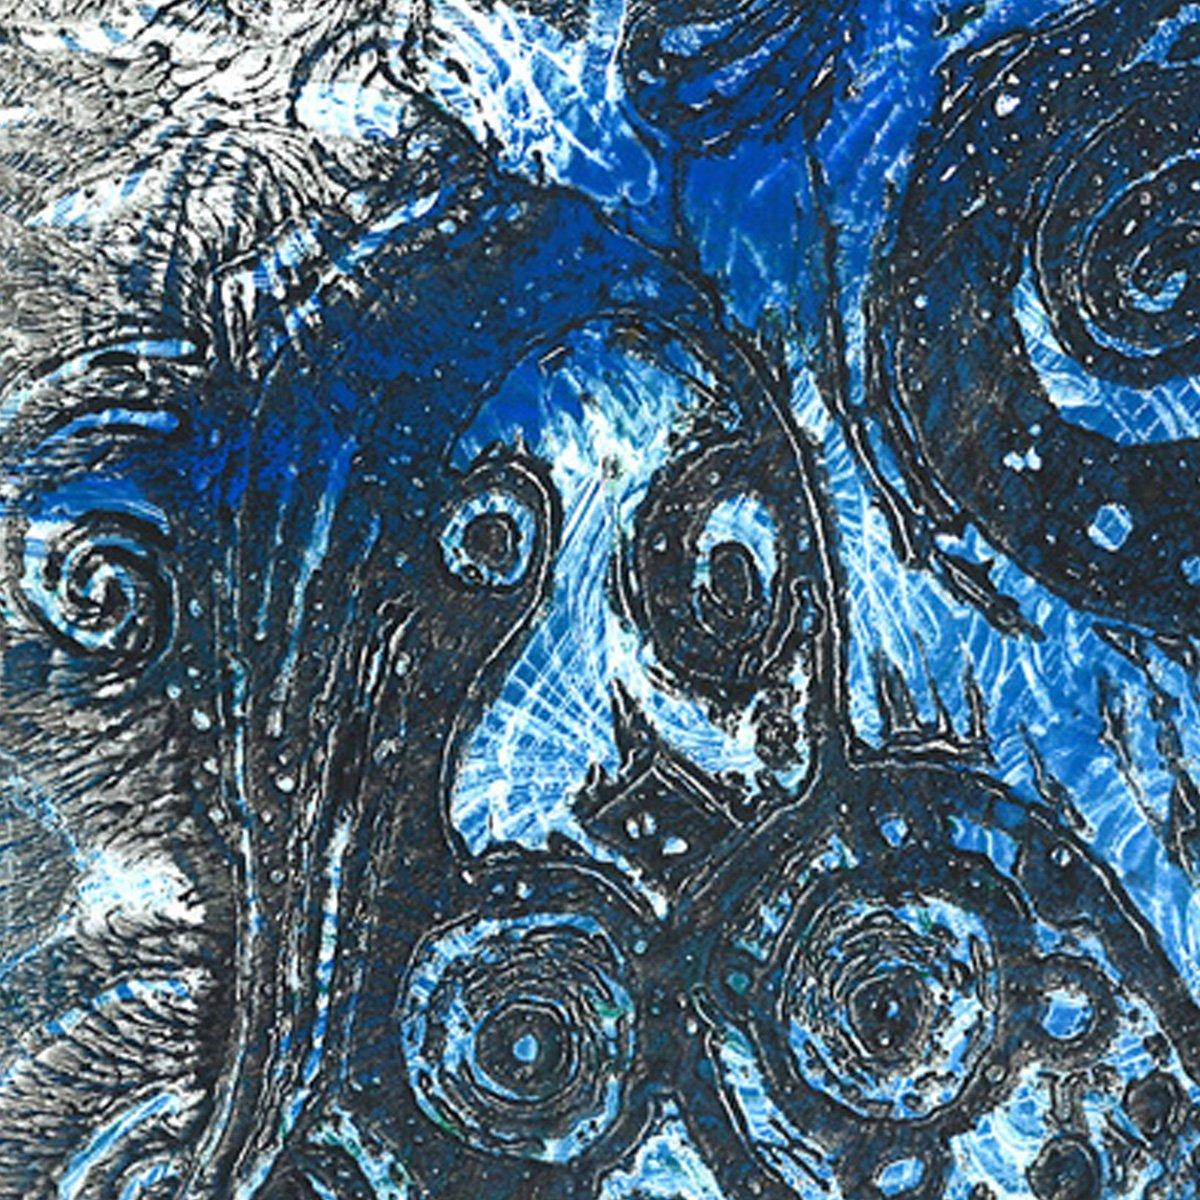 Mother of Fish Monoprint